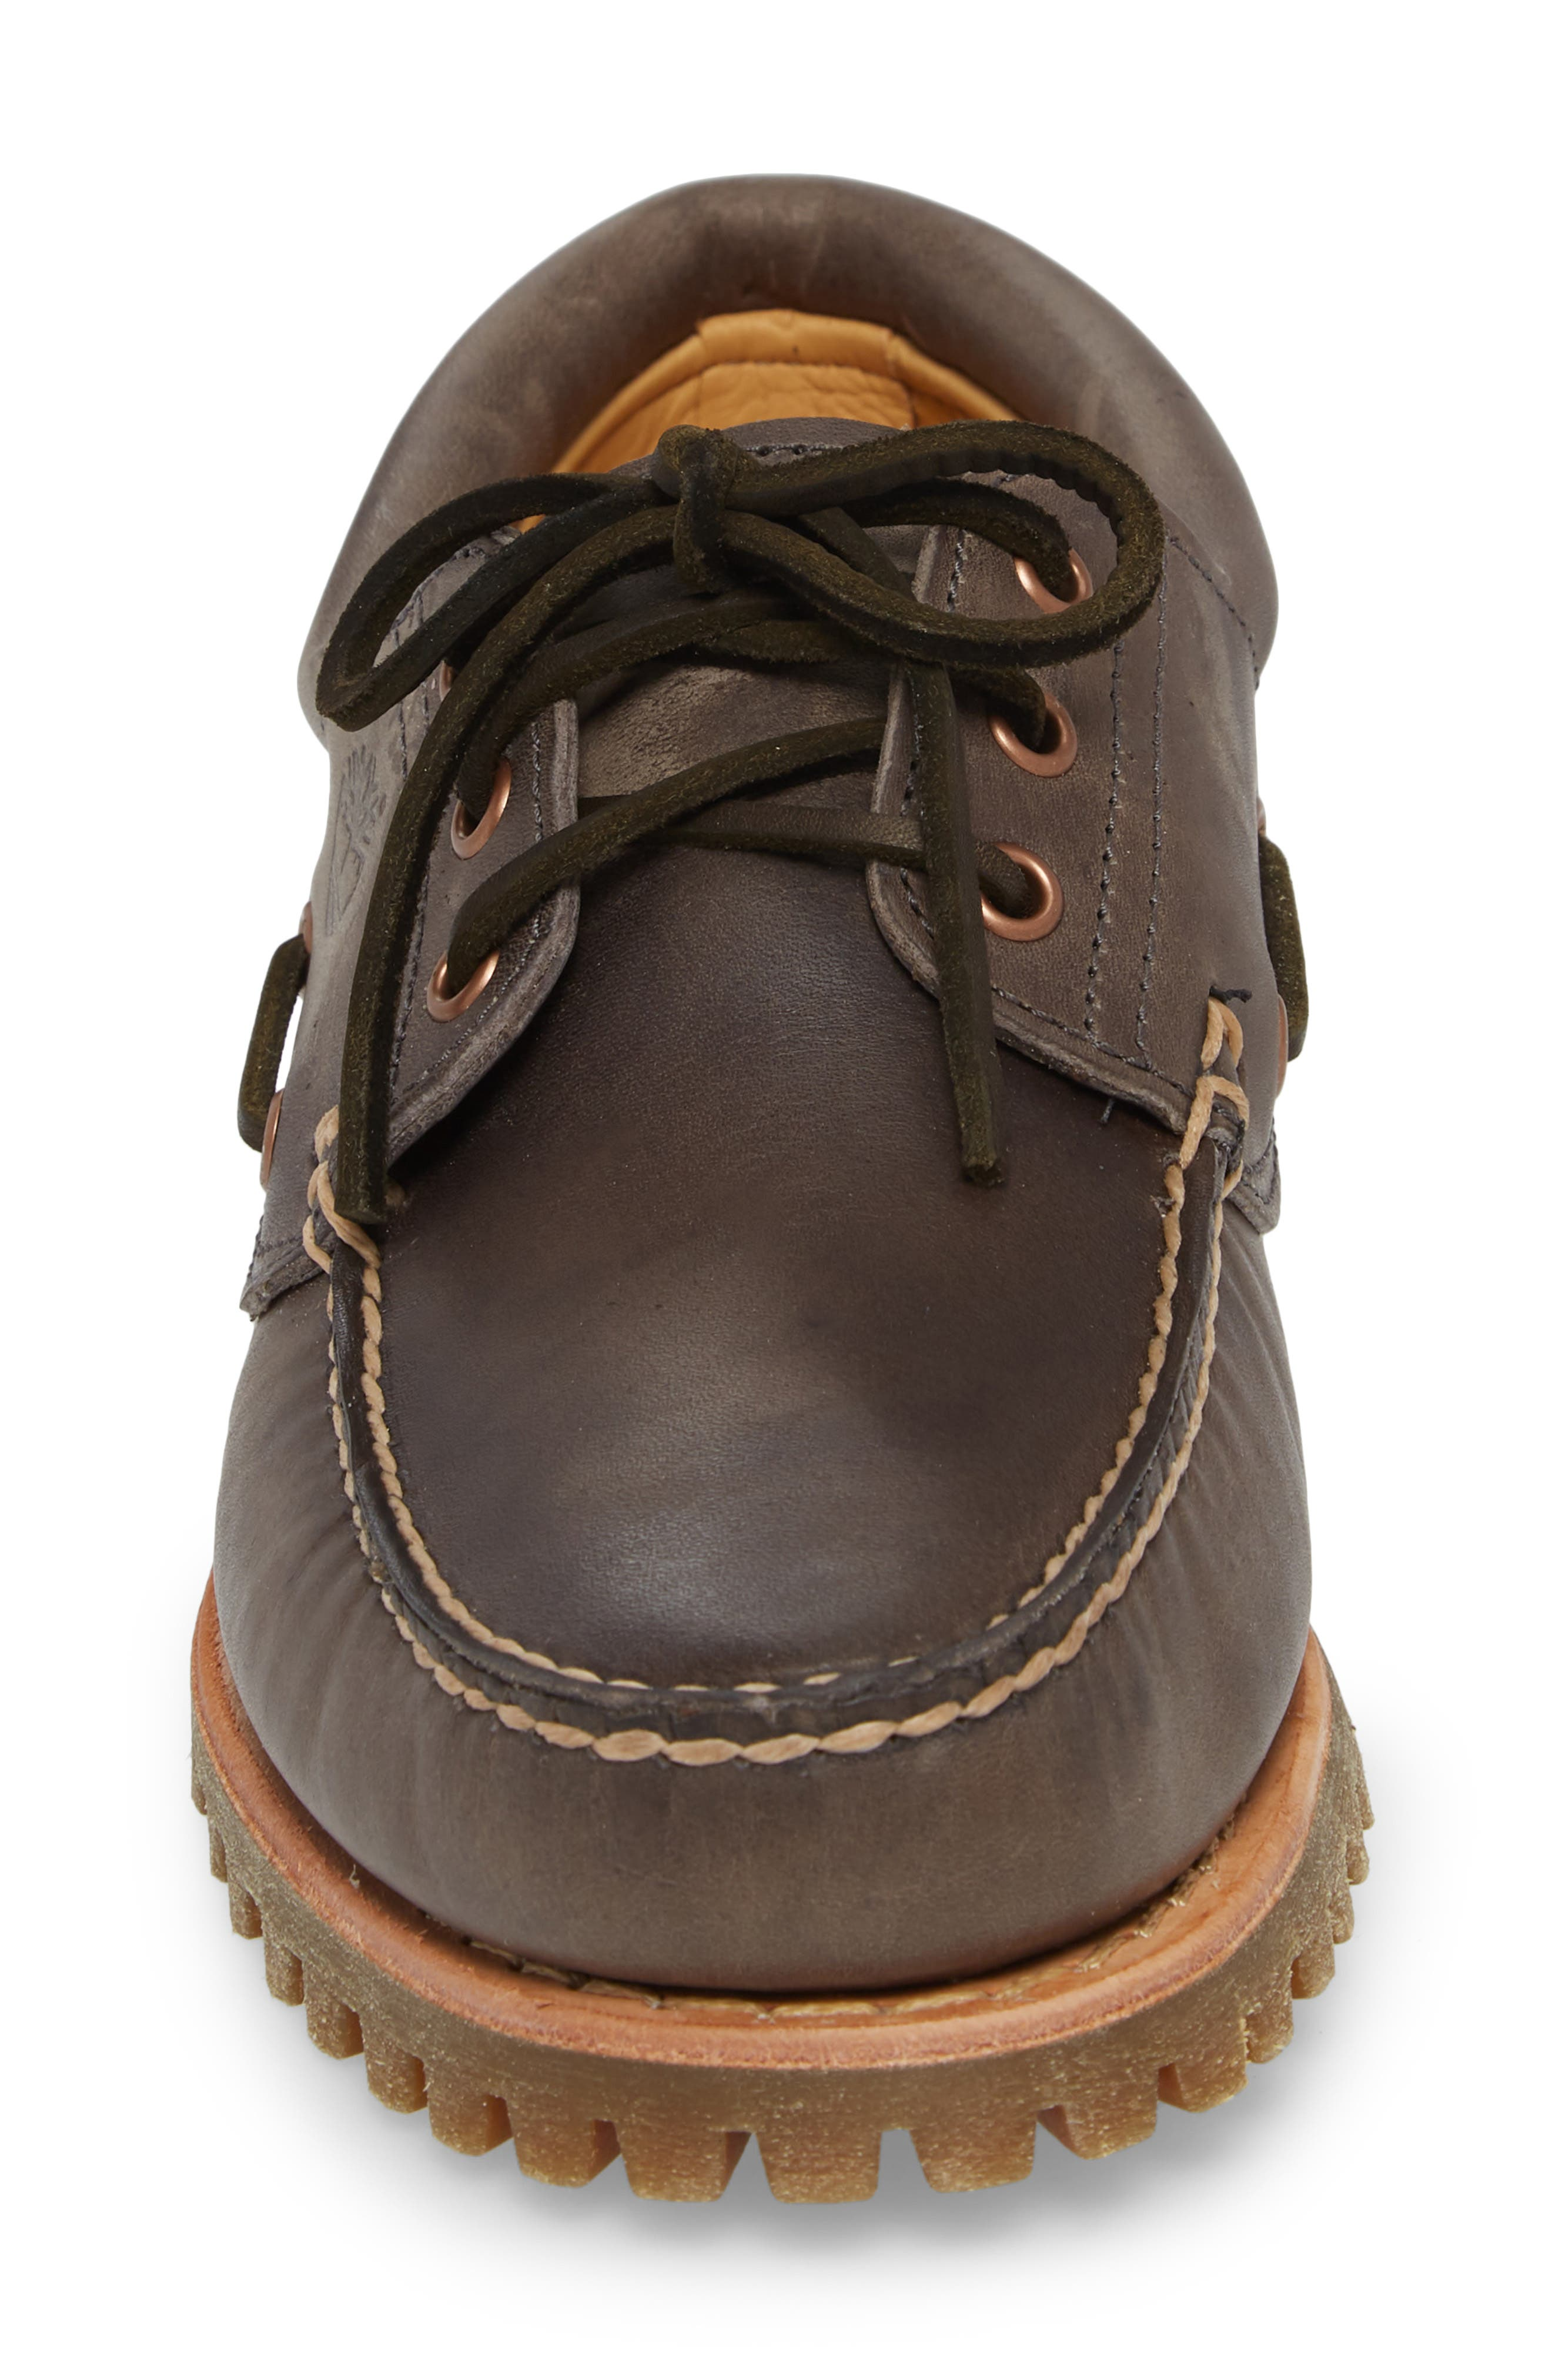 Lug Classic Boat Shoe,                             Alternate thumbnail 4, color,                             200